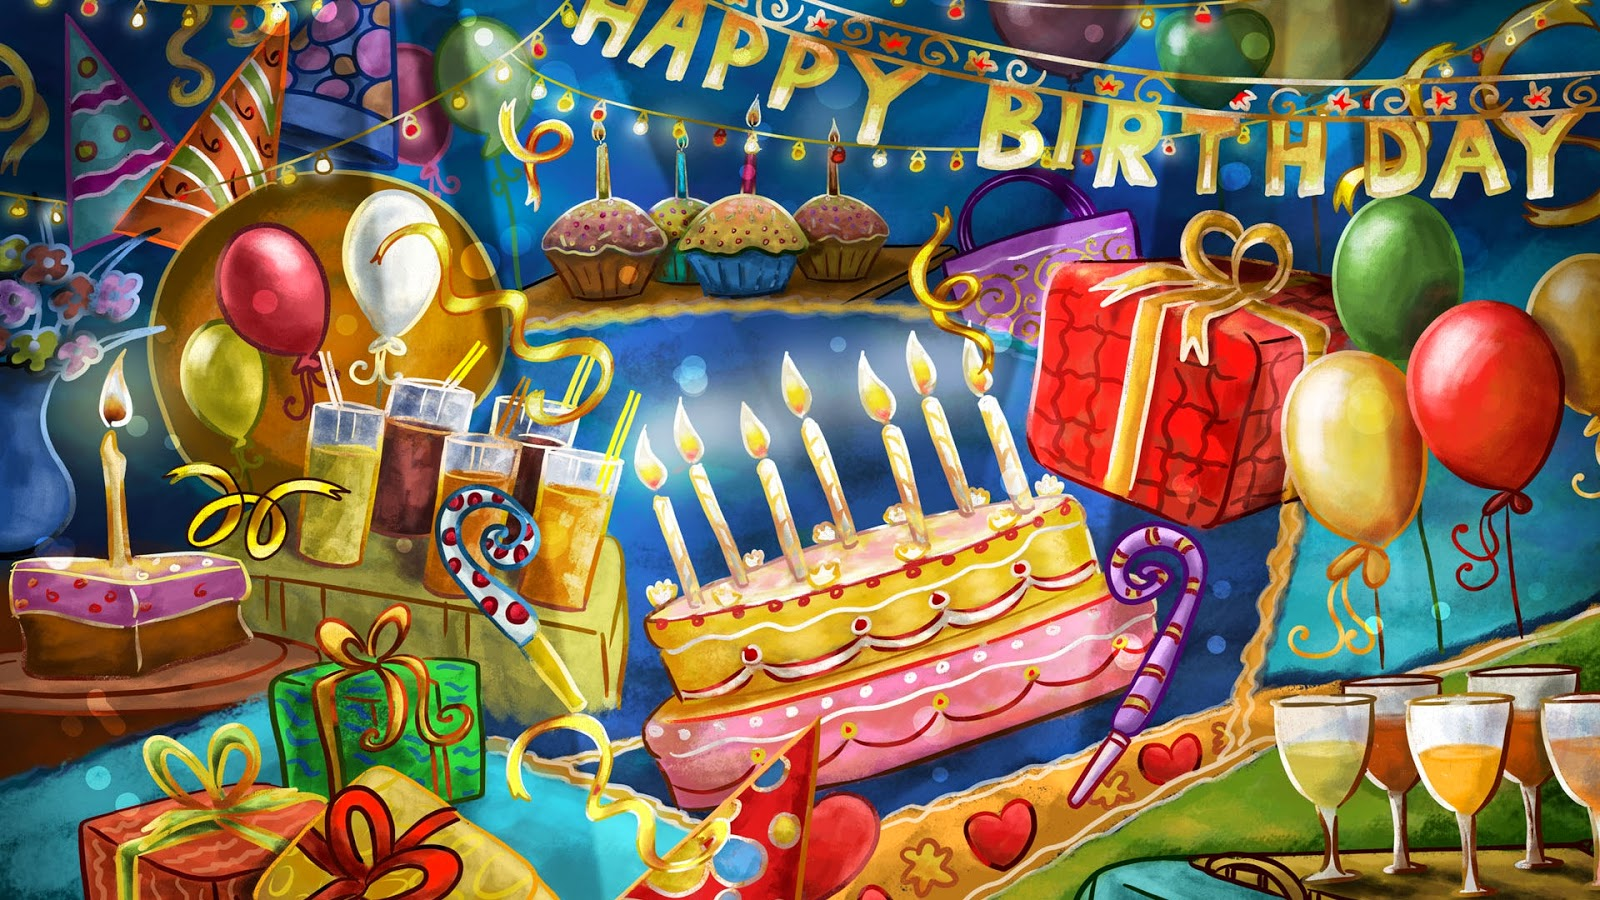 تهنئة عيد ميلاد سعيد